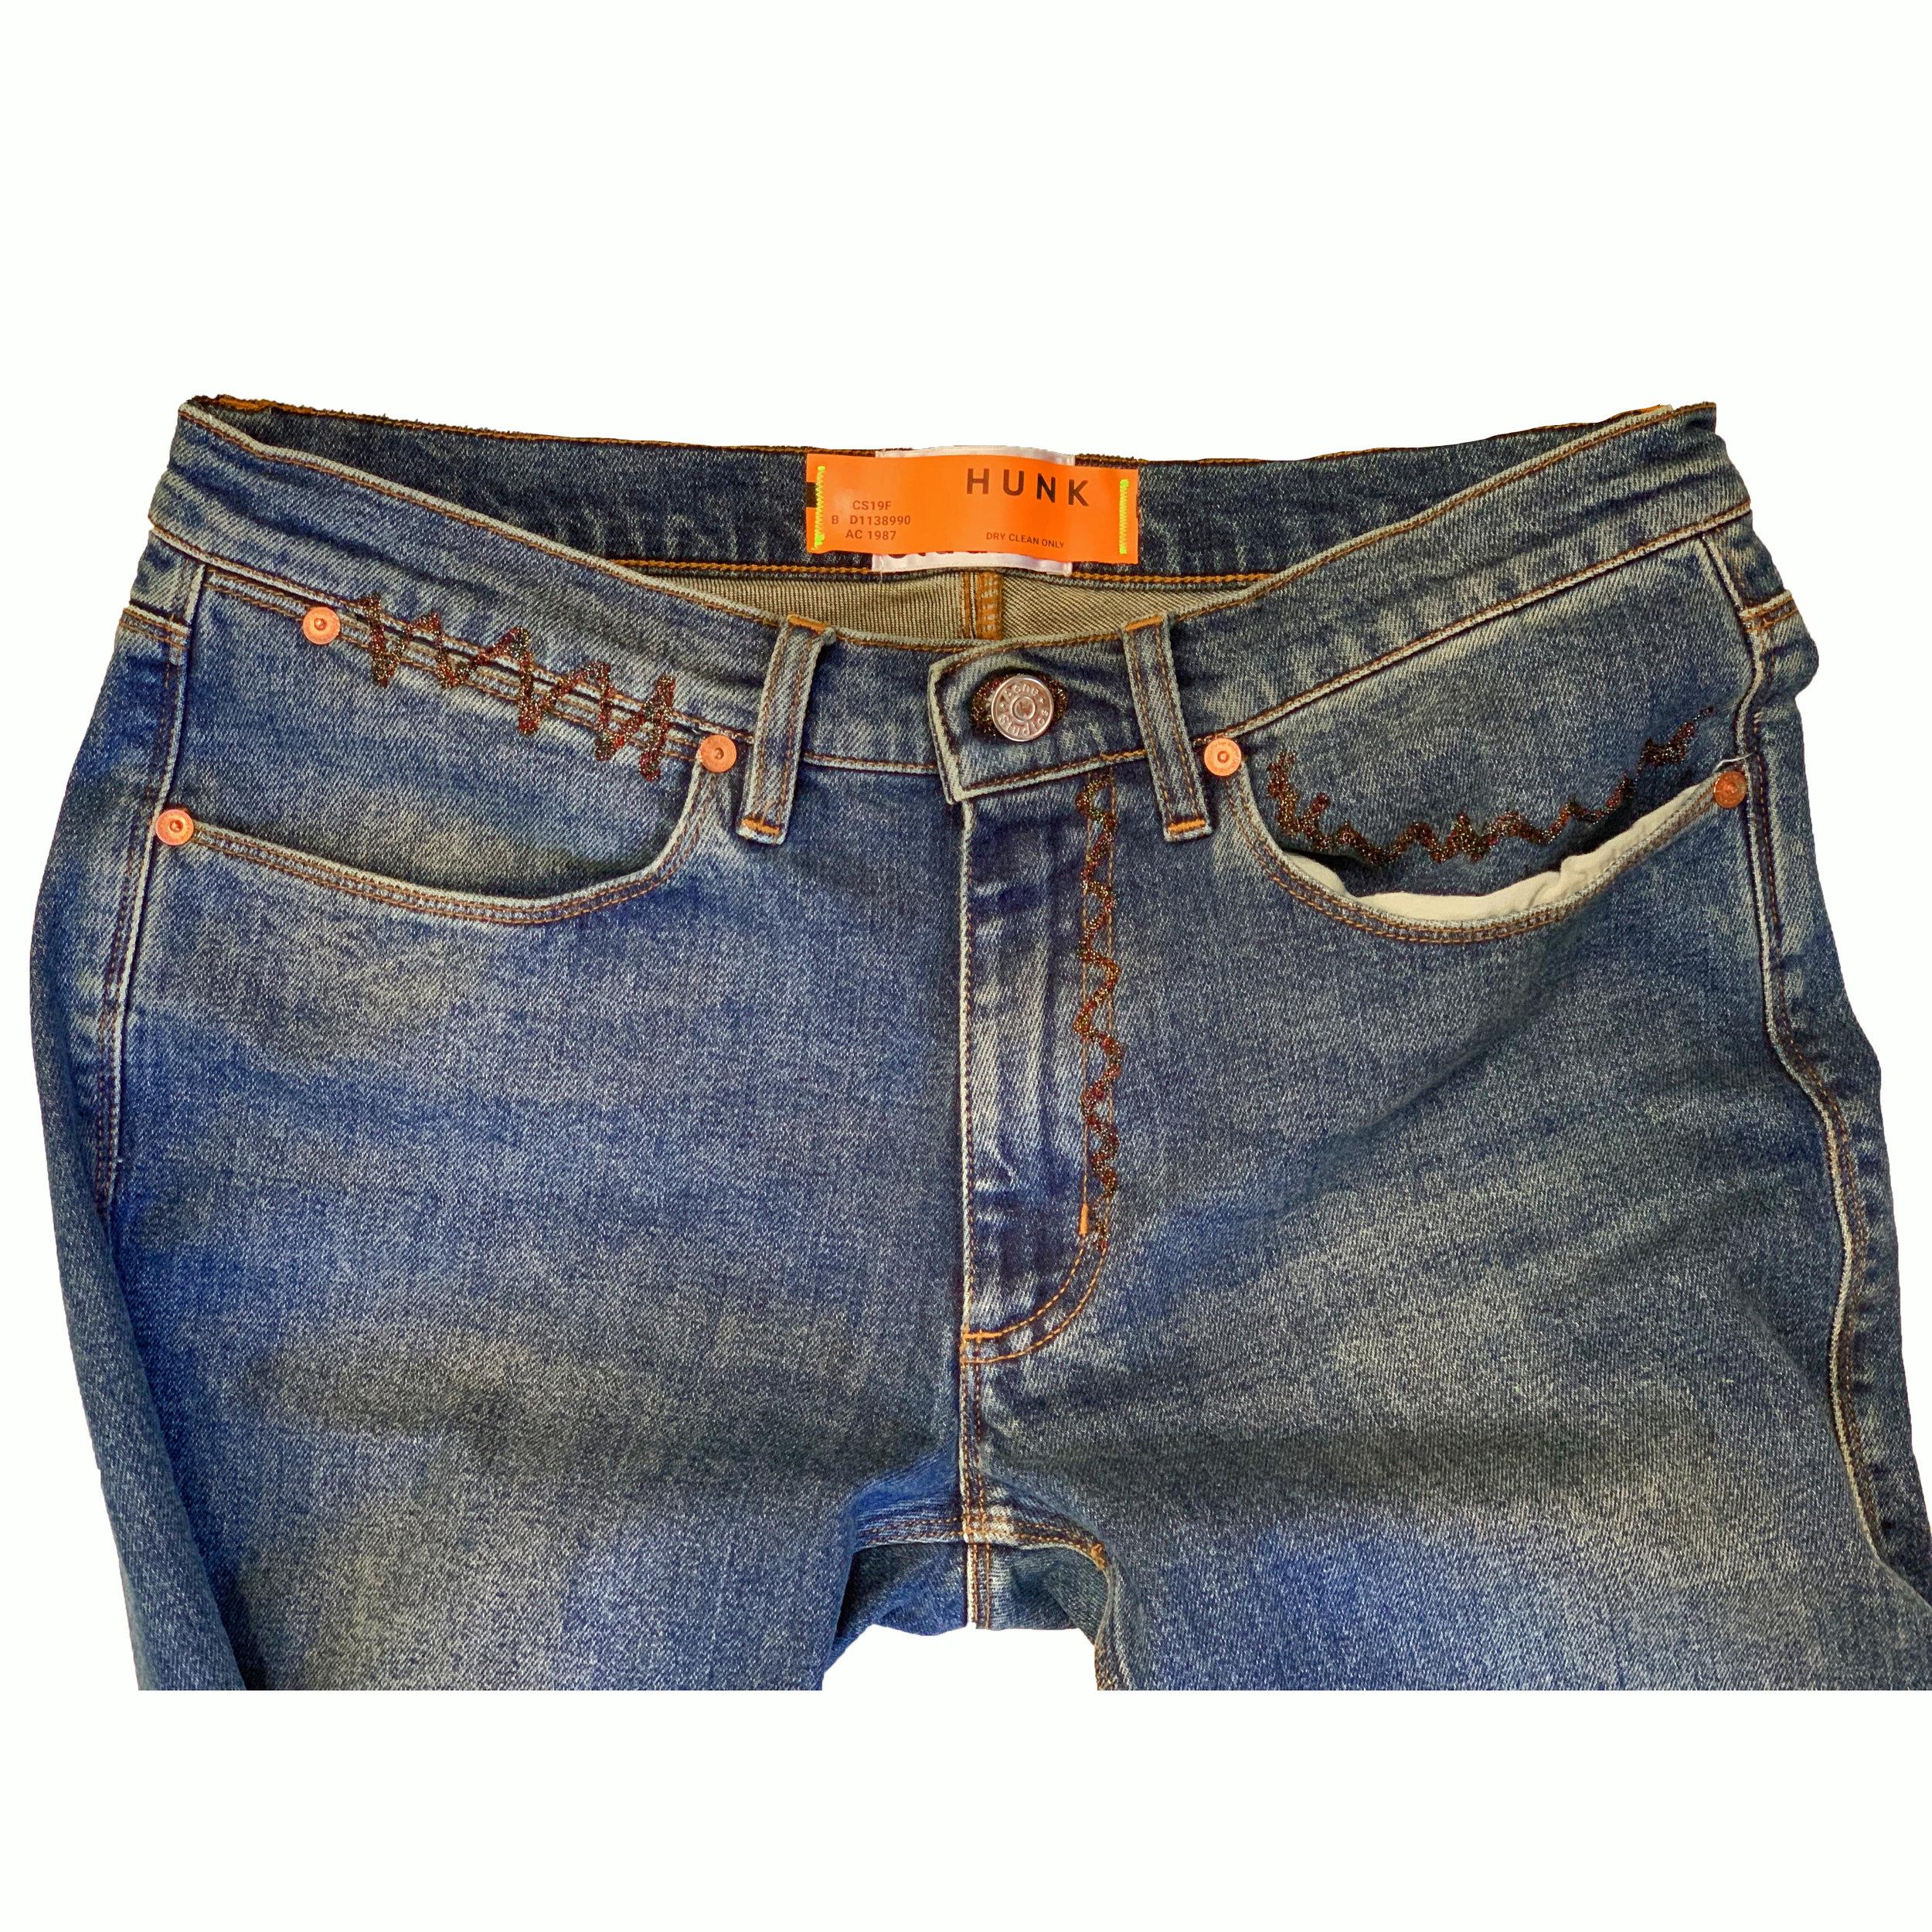 Acne Jeans Close Uo copy Square.jpg